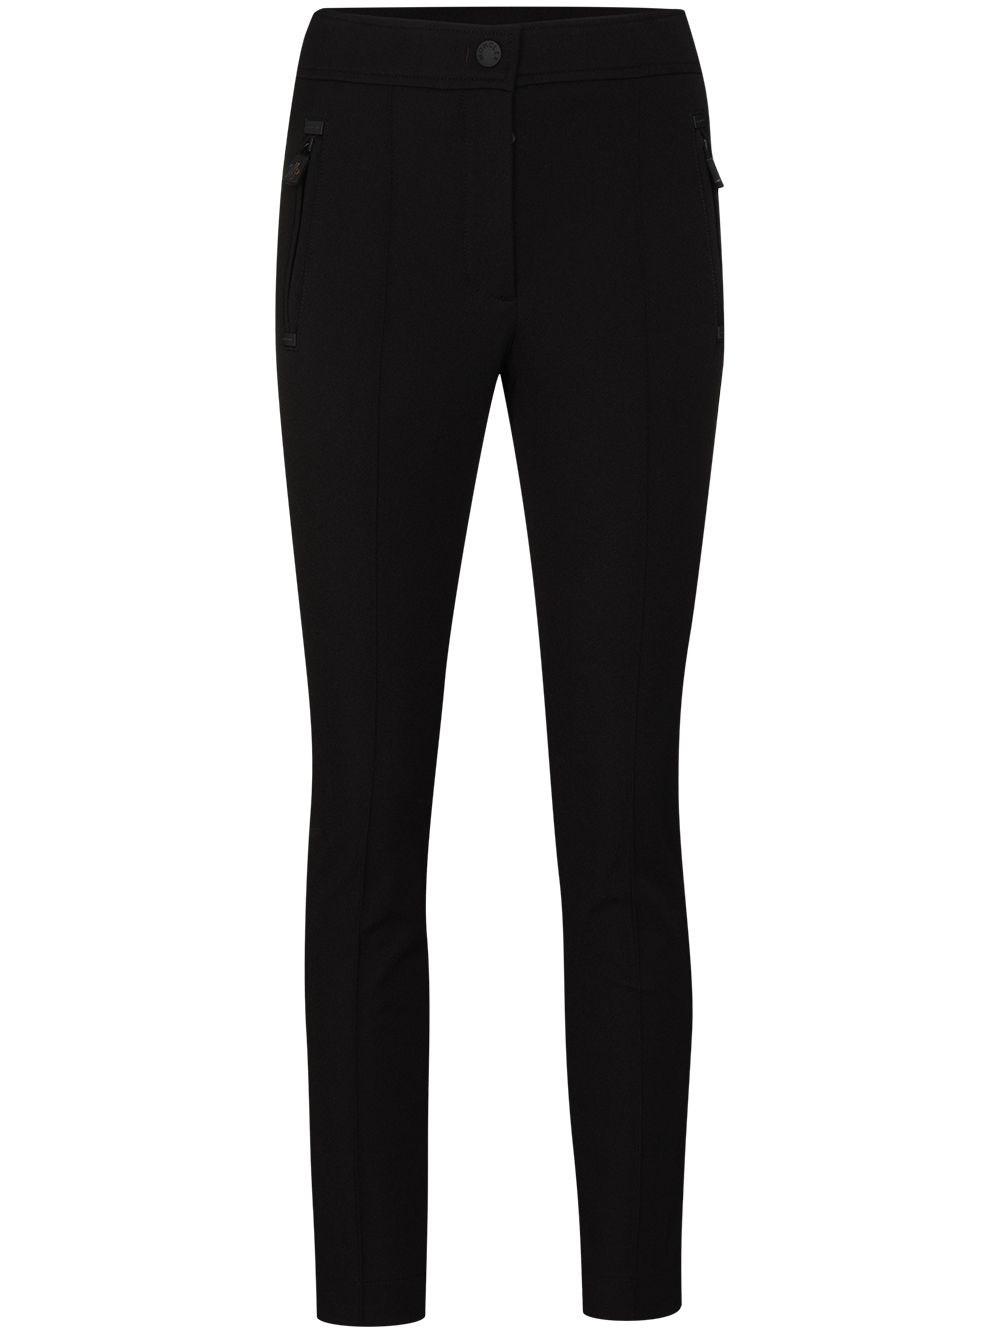 MONCLER GRENOBLE Black Skinny Jeans